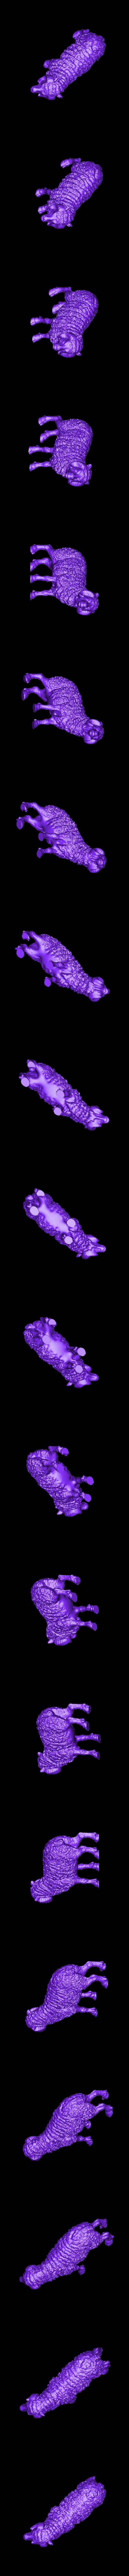 Sheep.stl Download free STL file Sheep • 3D printer model, sjpiper145